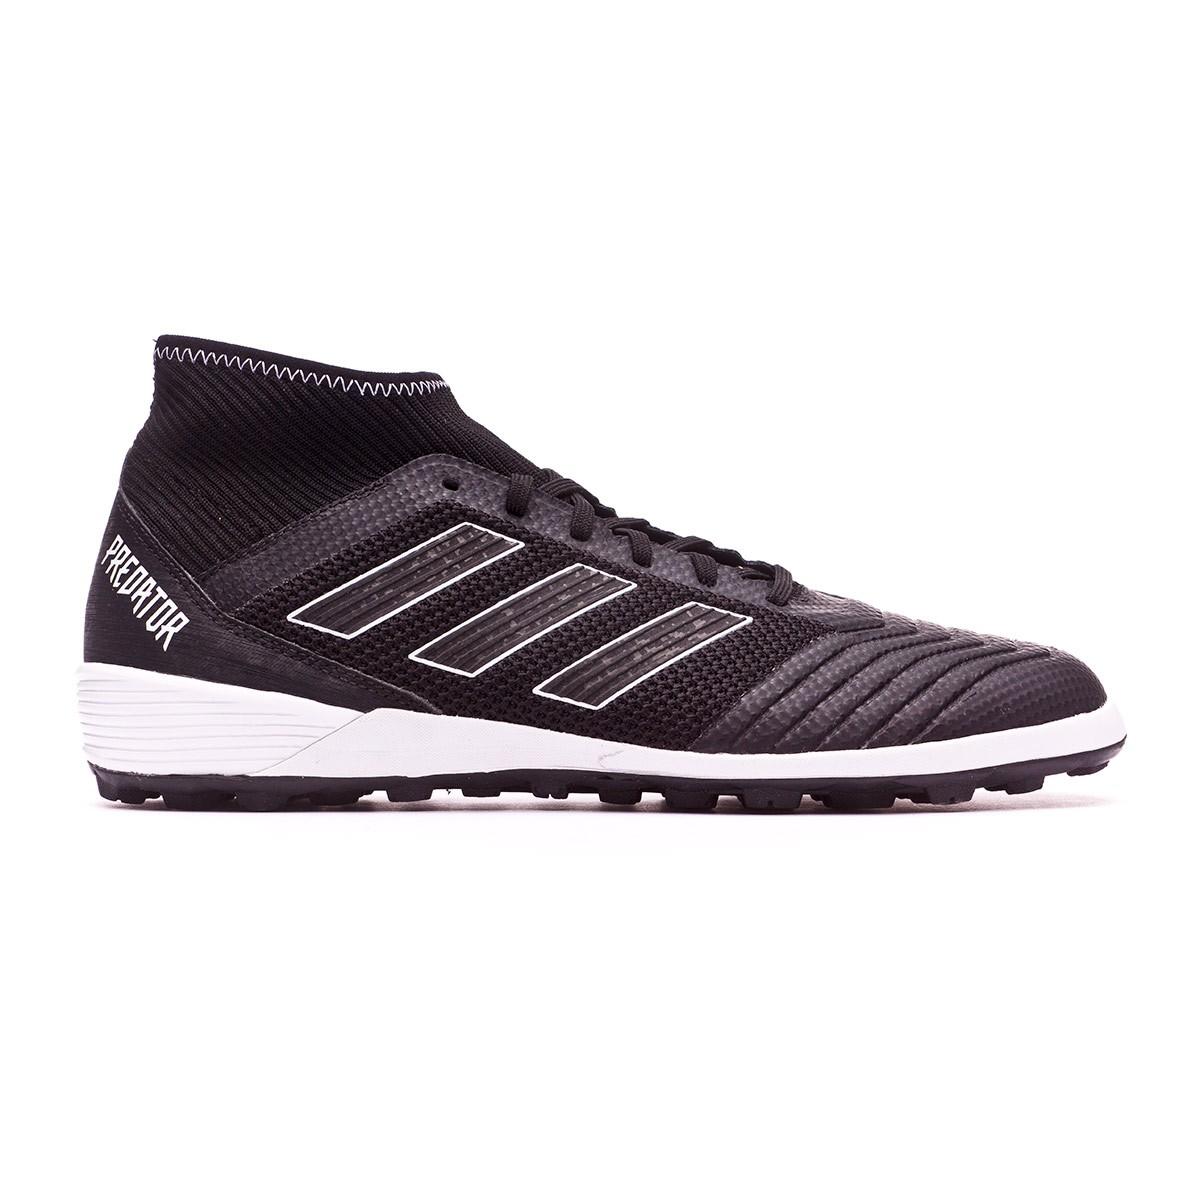 hot sale online 476e6 8a5cd Football Boot adidas Predator Tango 18.3 Turf Core black-White - Leaked  soccer